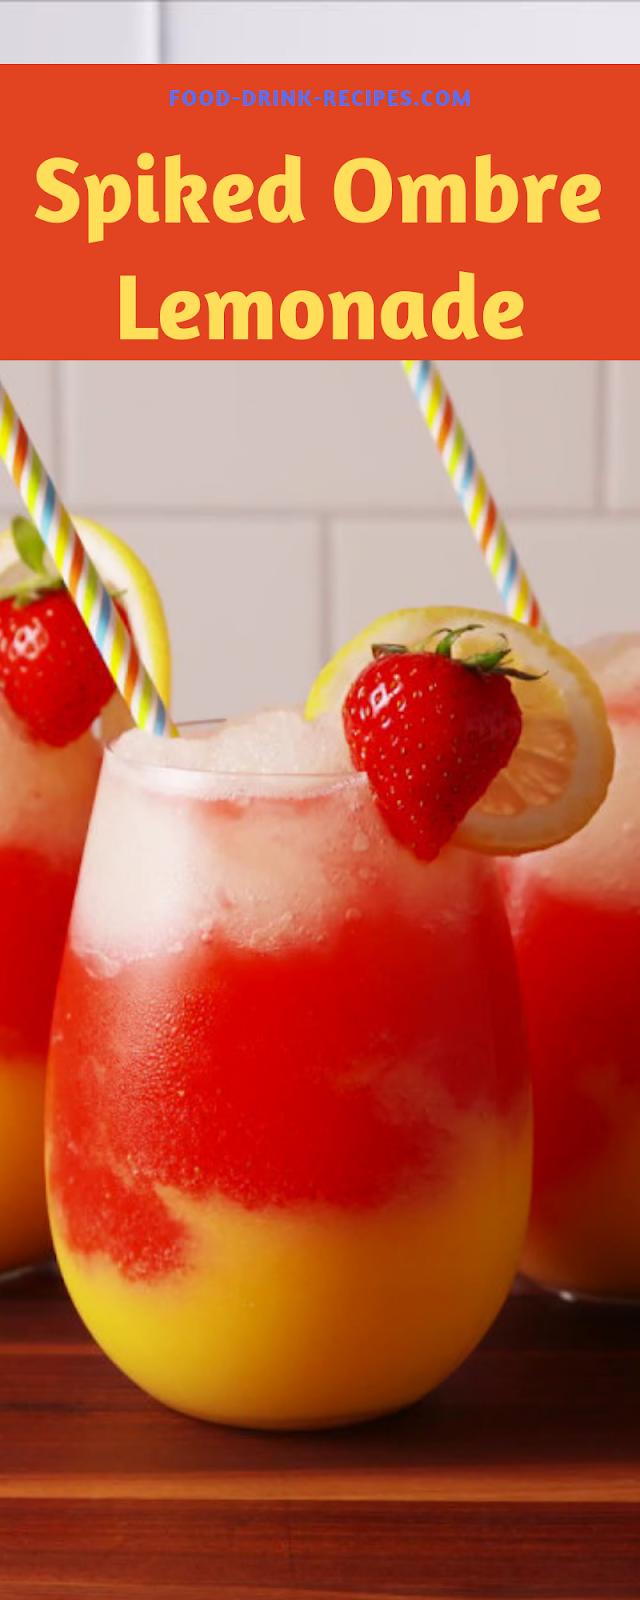 Spiked Ombre Lemonade - food-drink-recipes.com